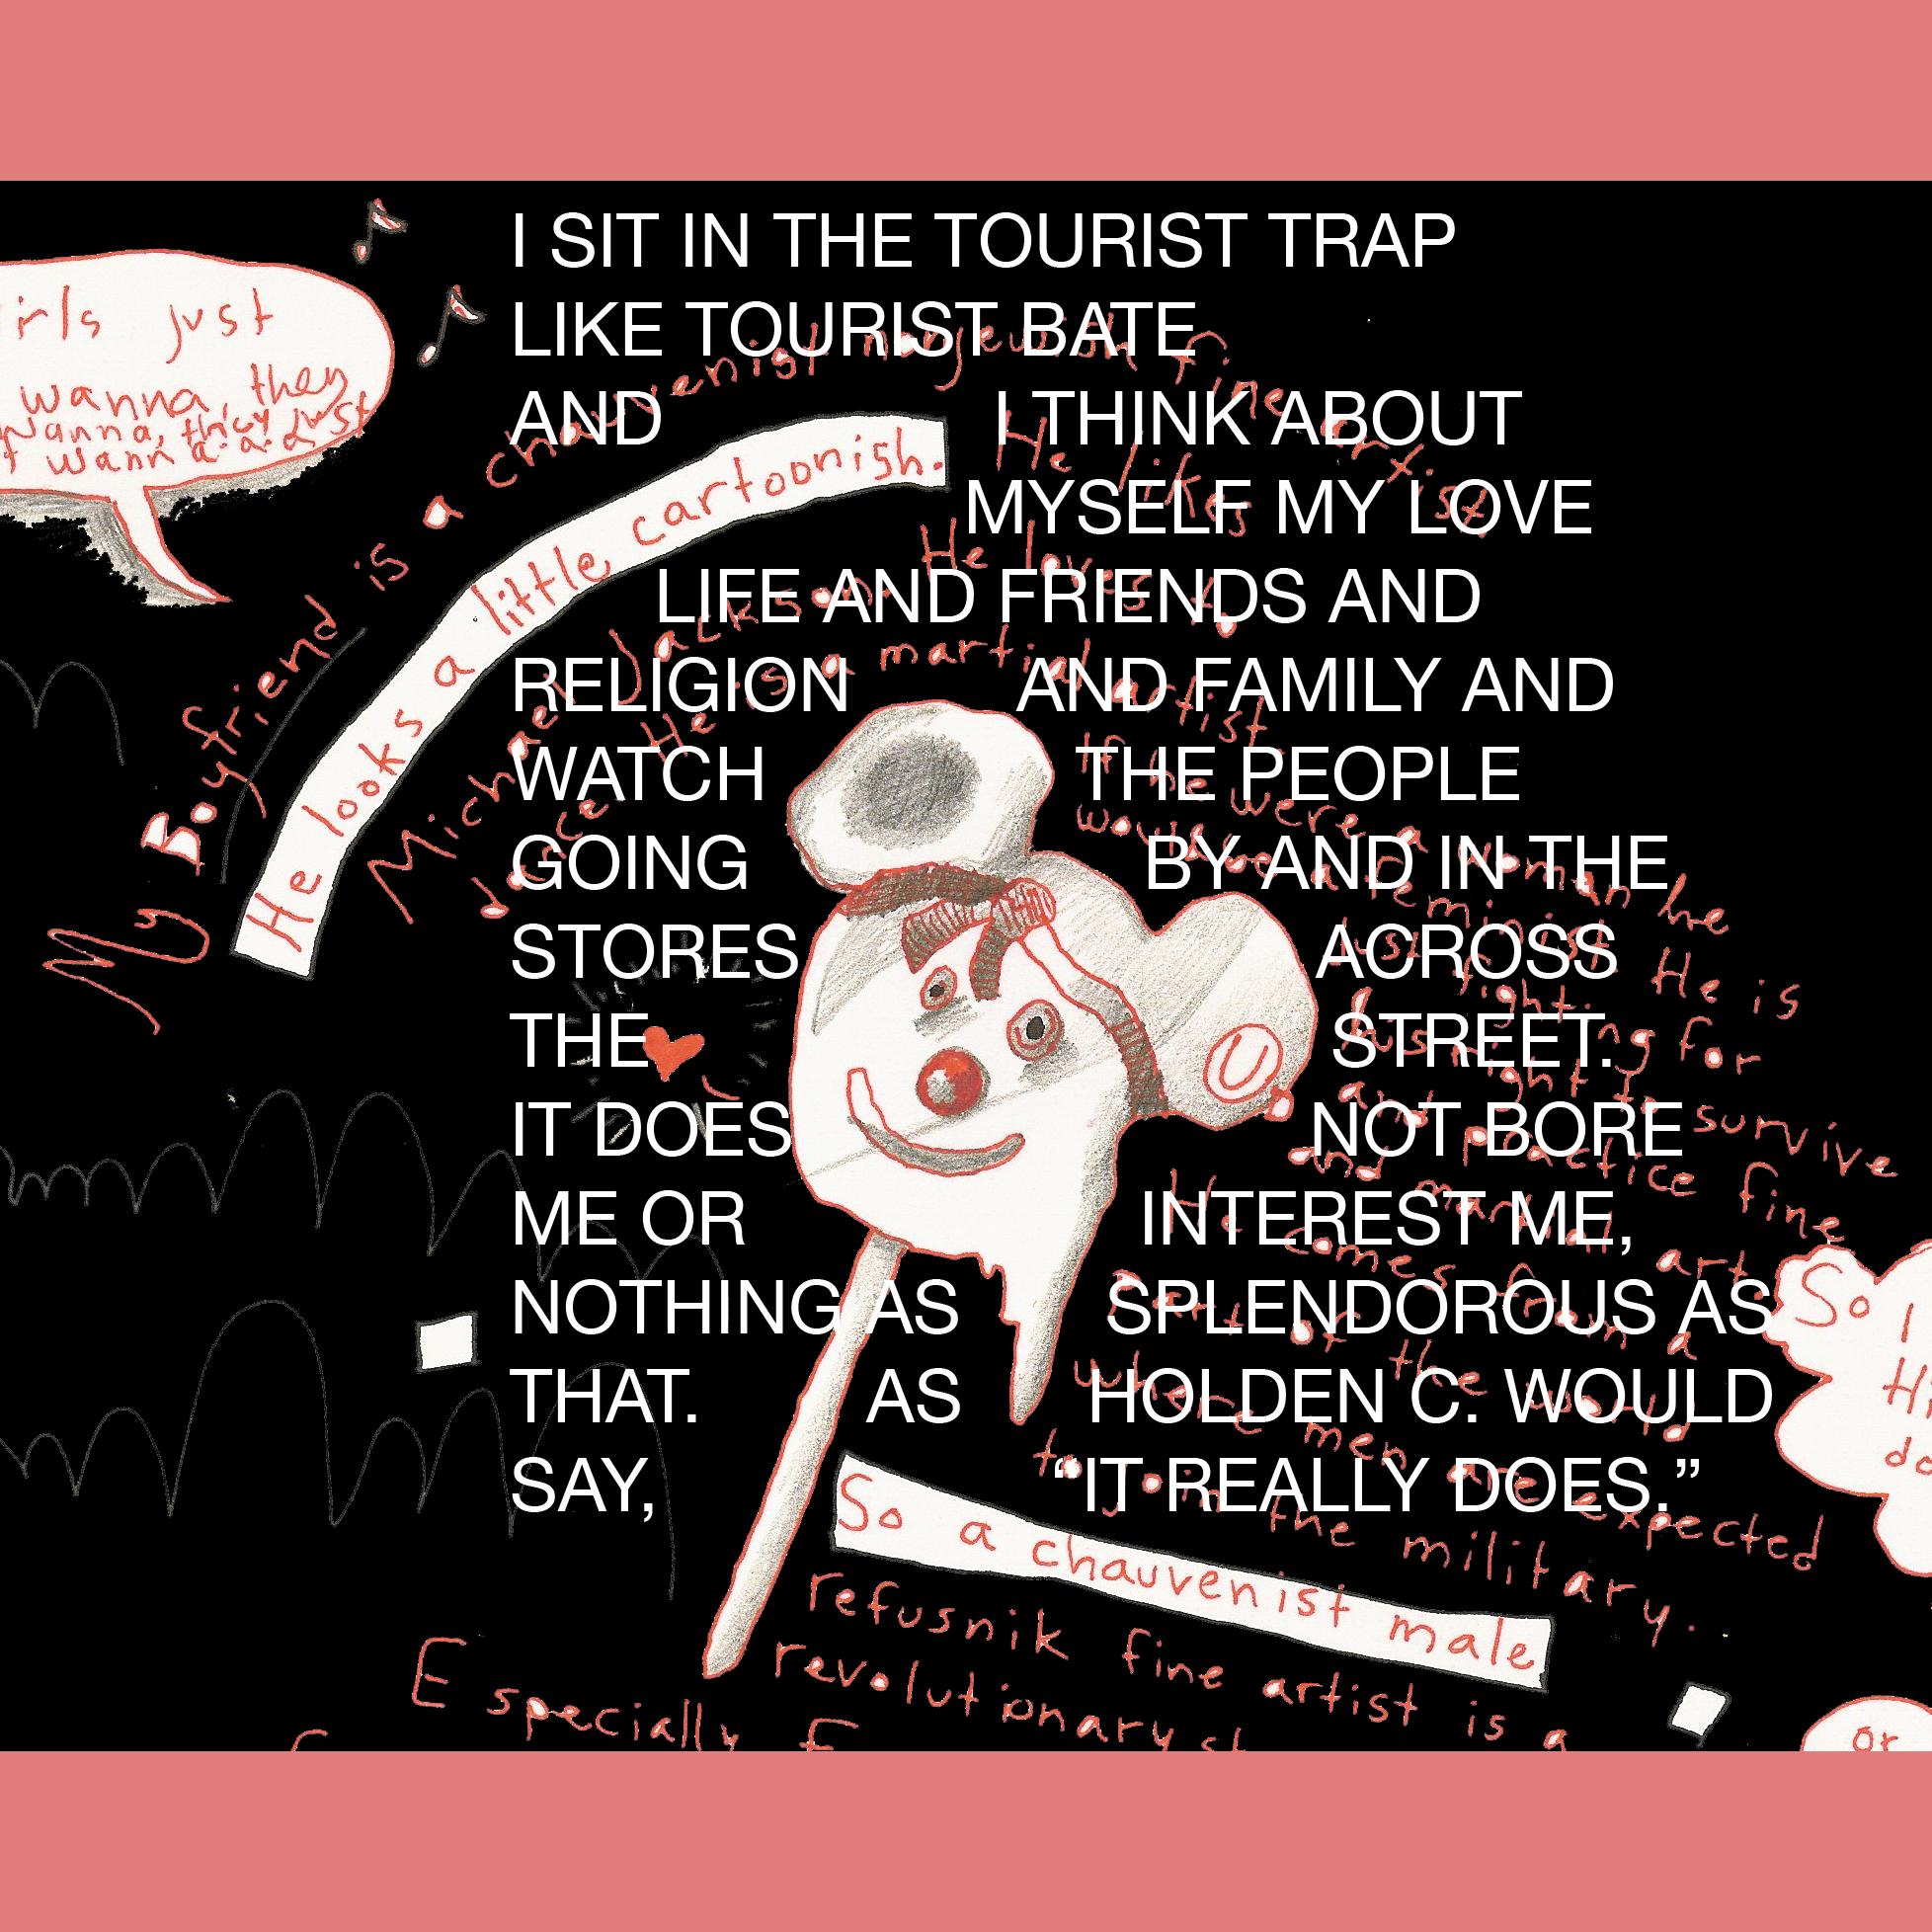 Blog 2, Panel 15